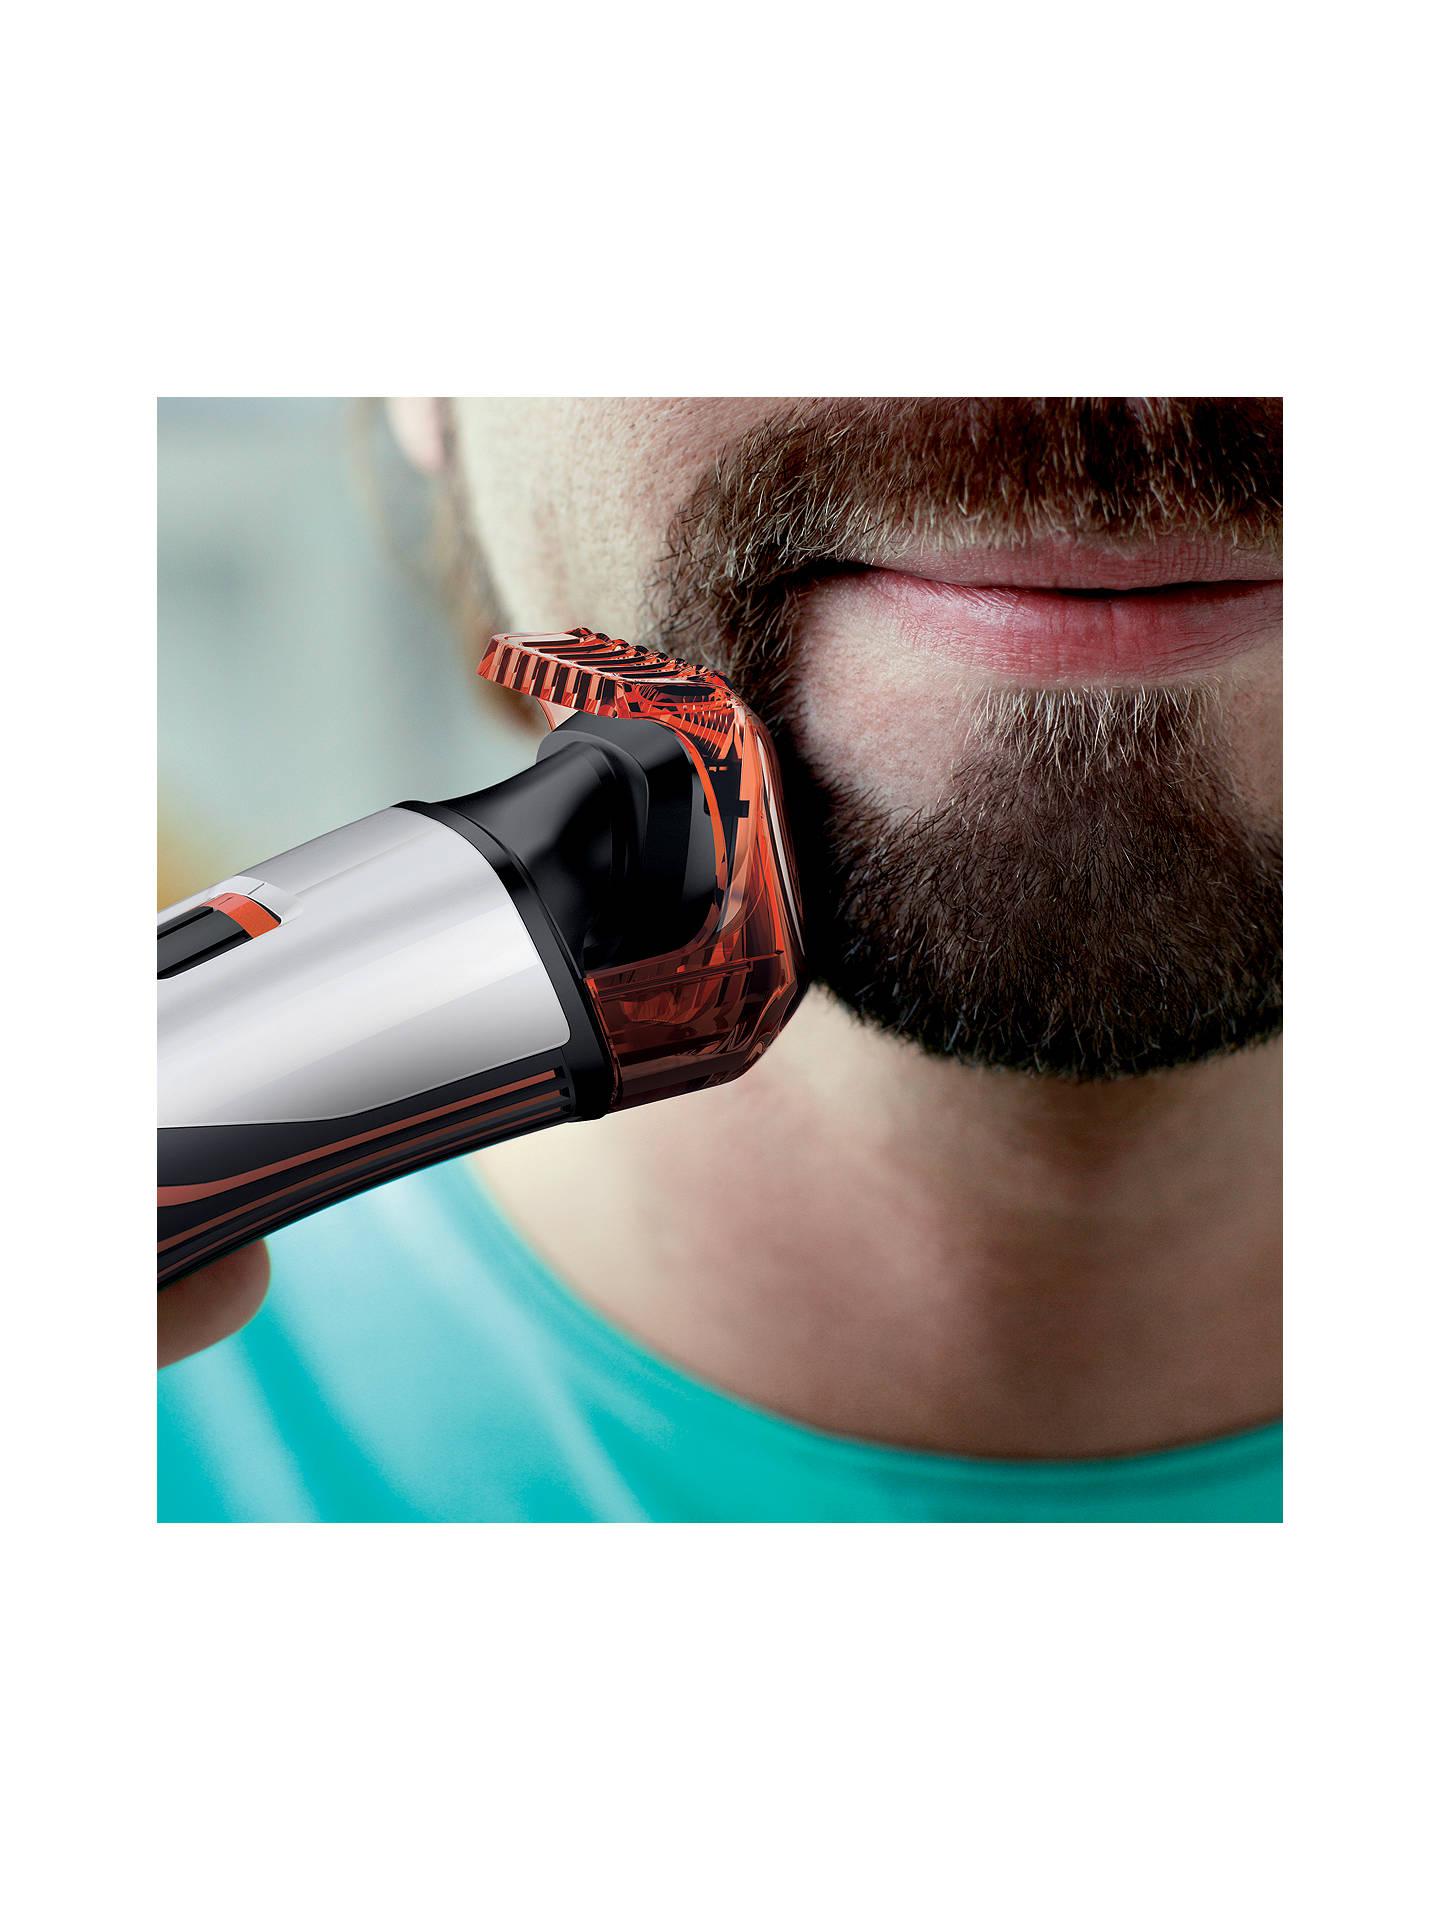 057bbf05541 ... Buy Philips QS6140/32 Beard Styleshaver Online at johnlewis.com